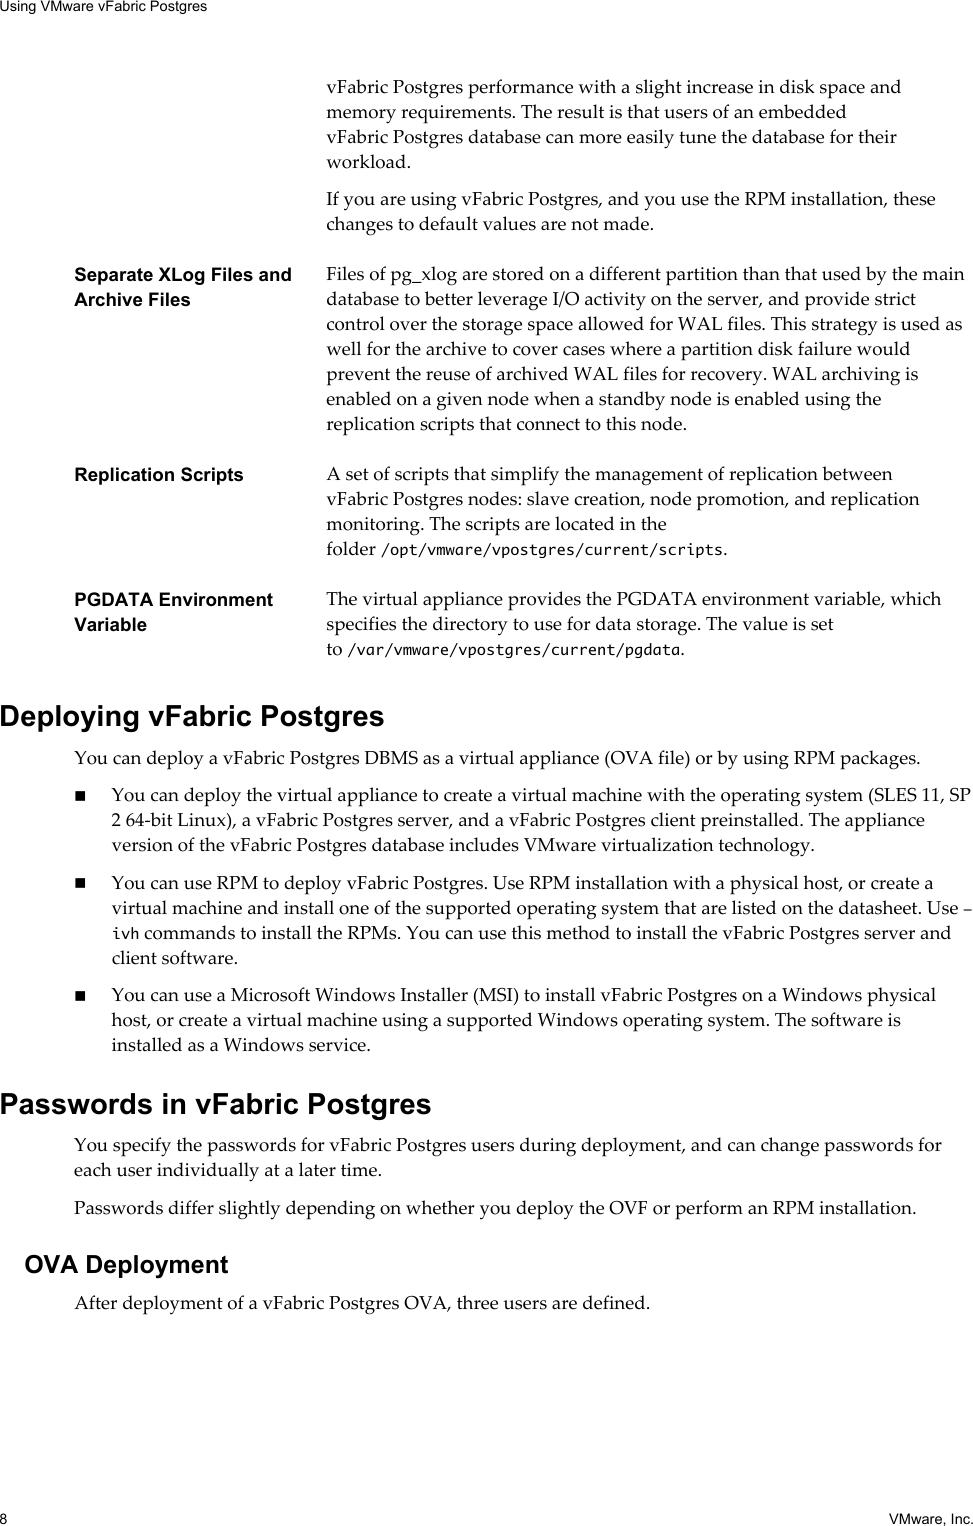 Vmware Using VFabric Postgres 9 3 2 V Fabric User Guide 93 ug en